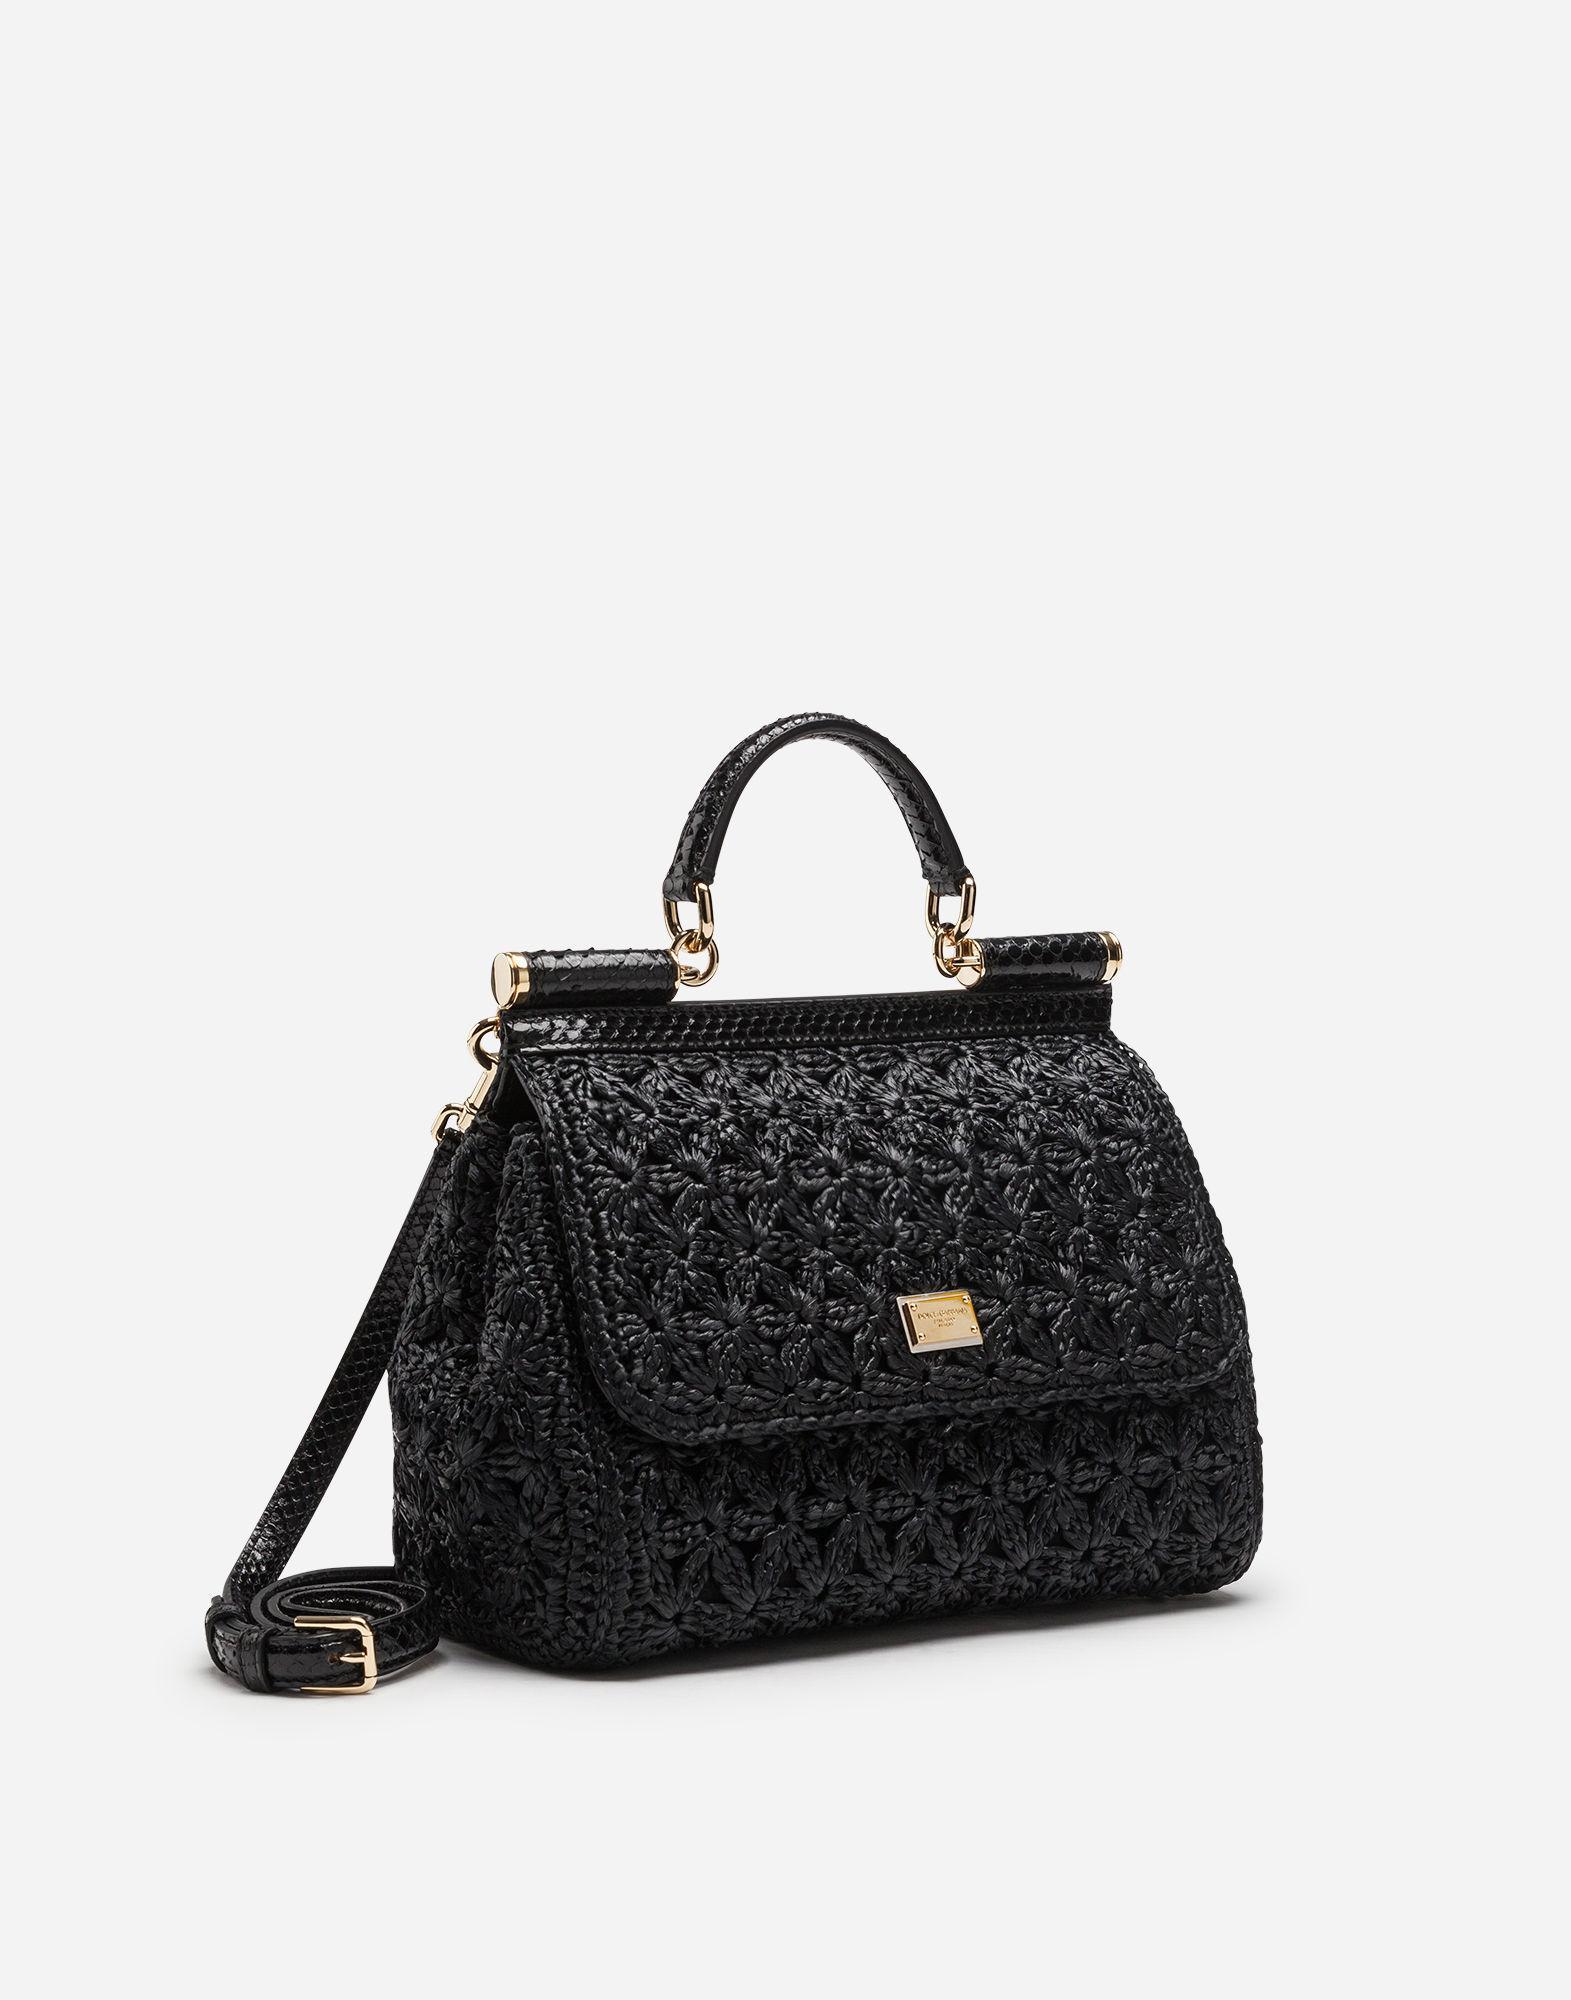 78e47ce12504 Lyst - Dolce   Gabbana Medium Raffia Crochet Sicily Bag in Black - Save 7%